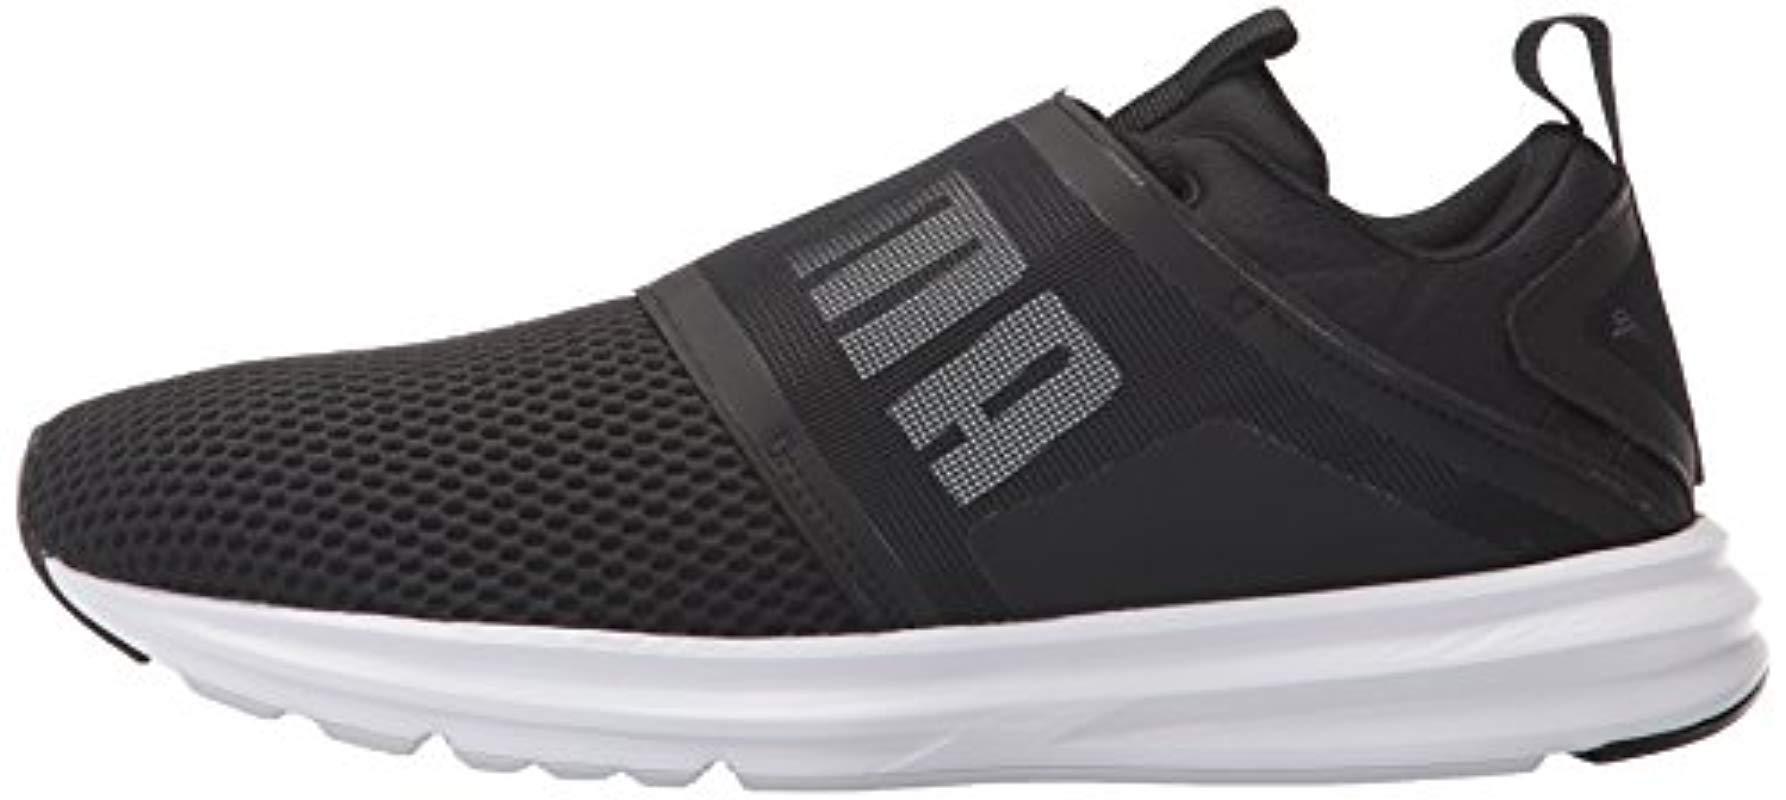 PUMA Enzo Strap Mesh Sneaker in Black